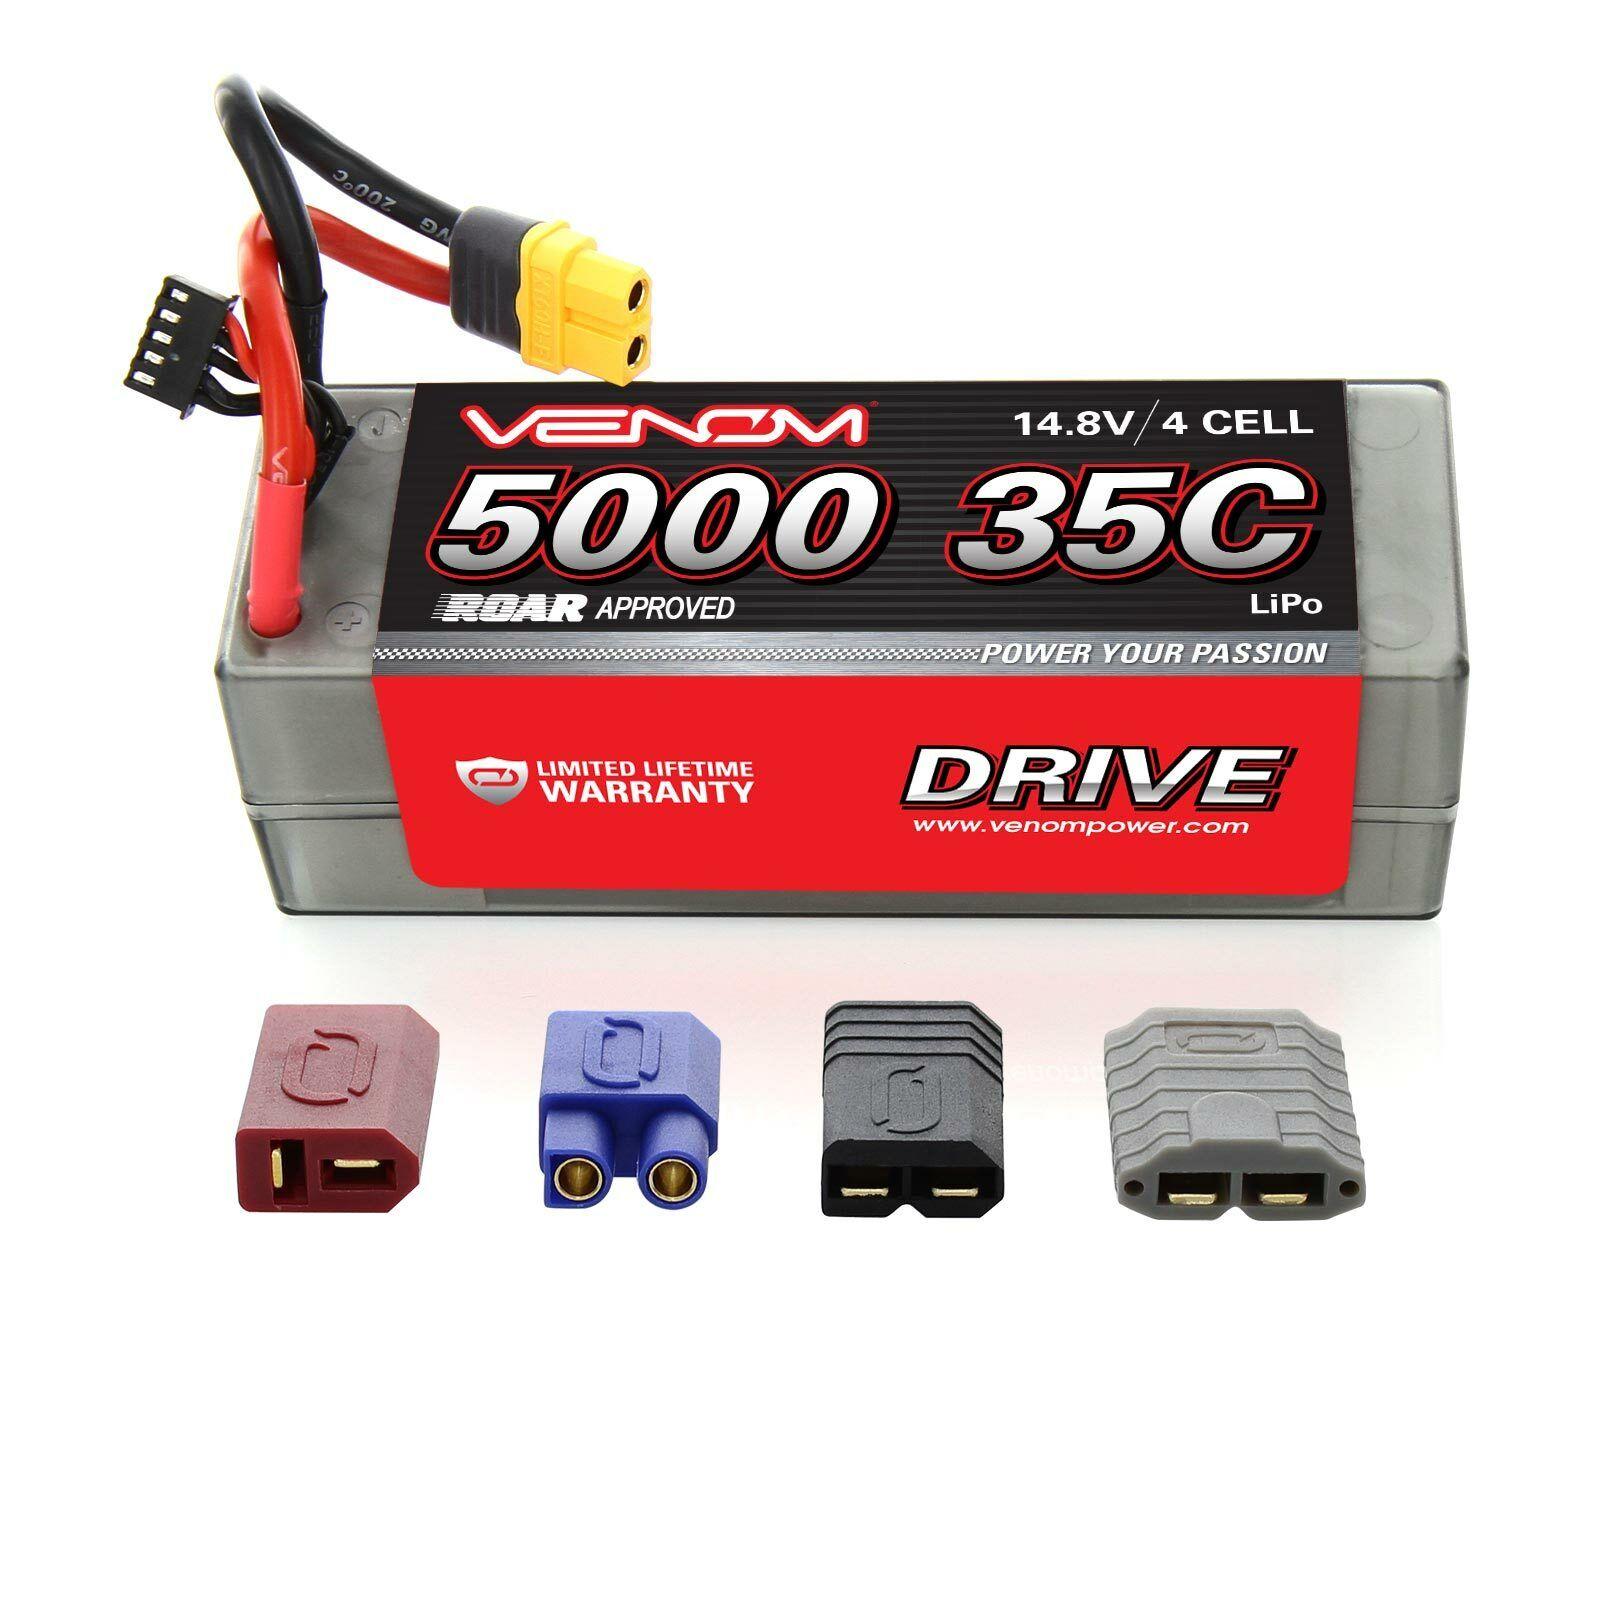 Venom 35C 4S 5000mAh 14.8V Hard Case RC LiPo Battery ROAR Approved with UNI Plug